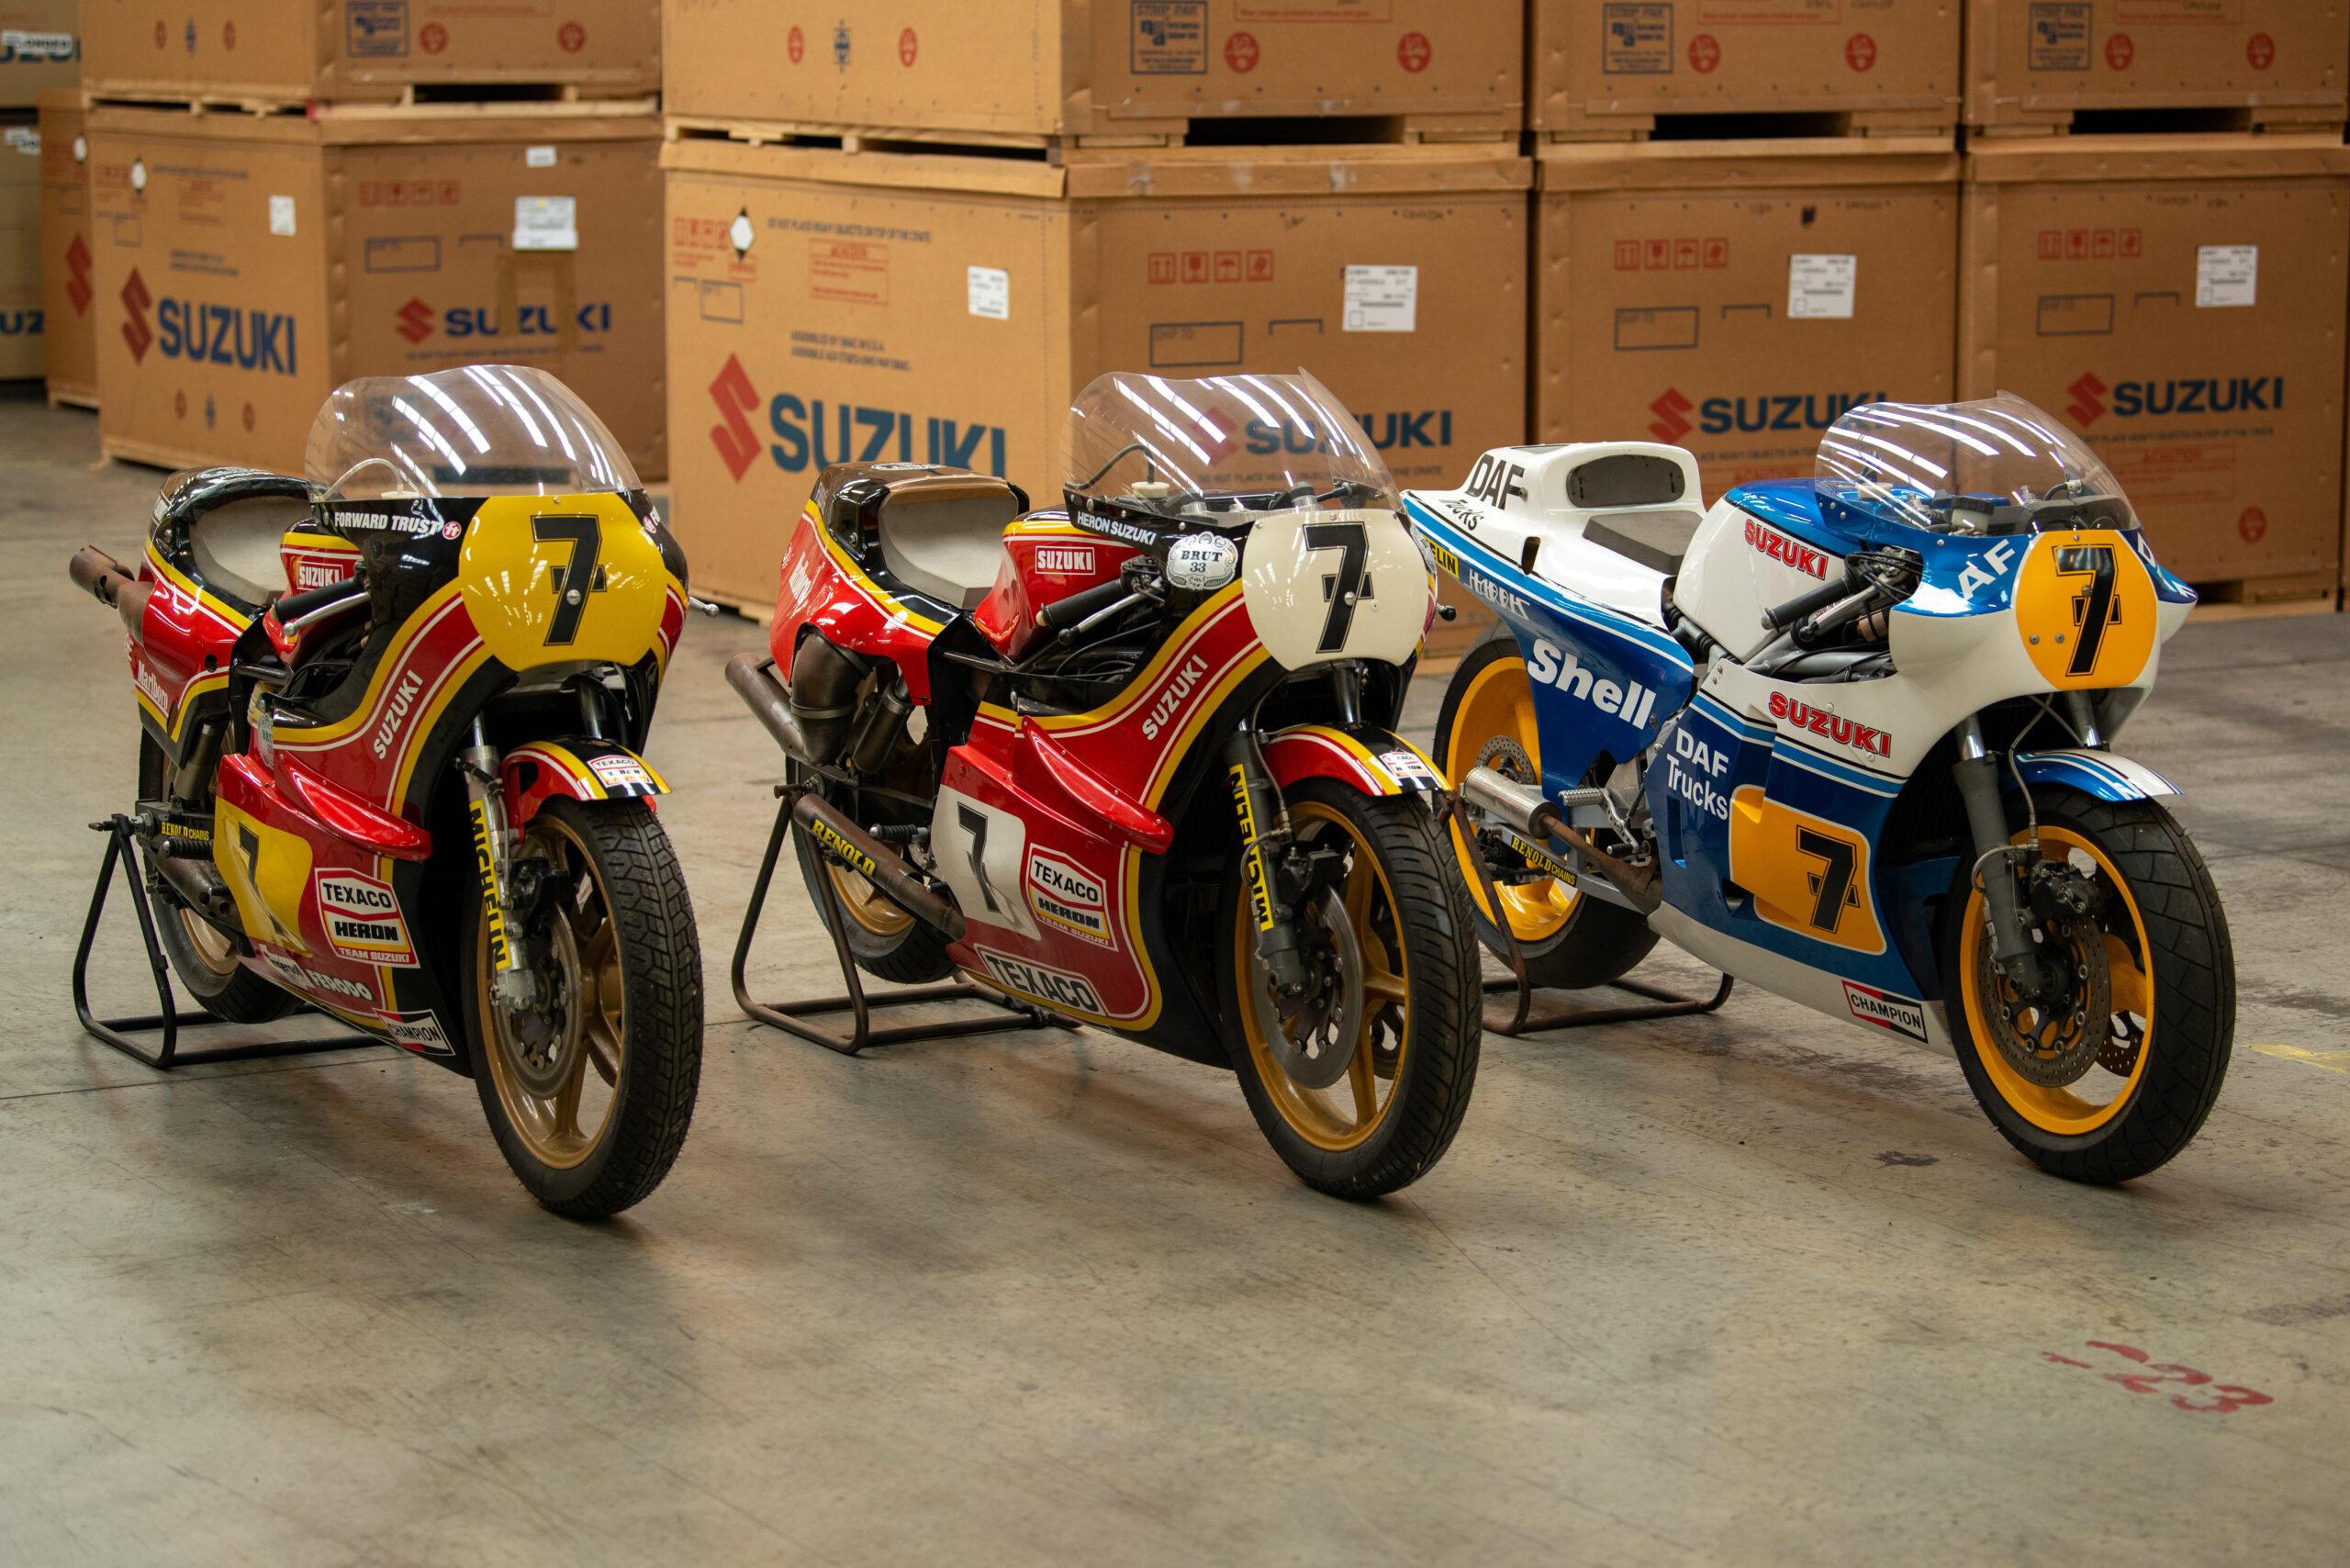 Suzuki To Restore More Sheene Bikes At Motorcycle Live